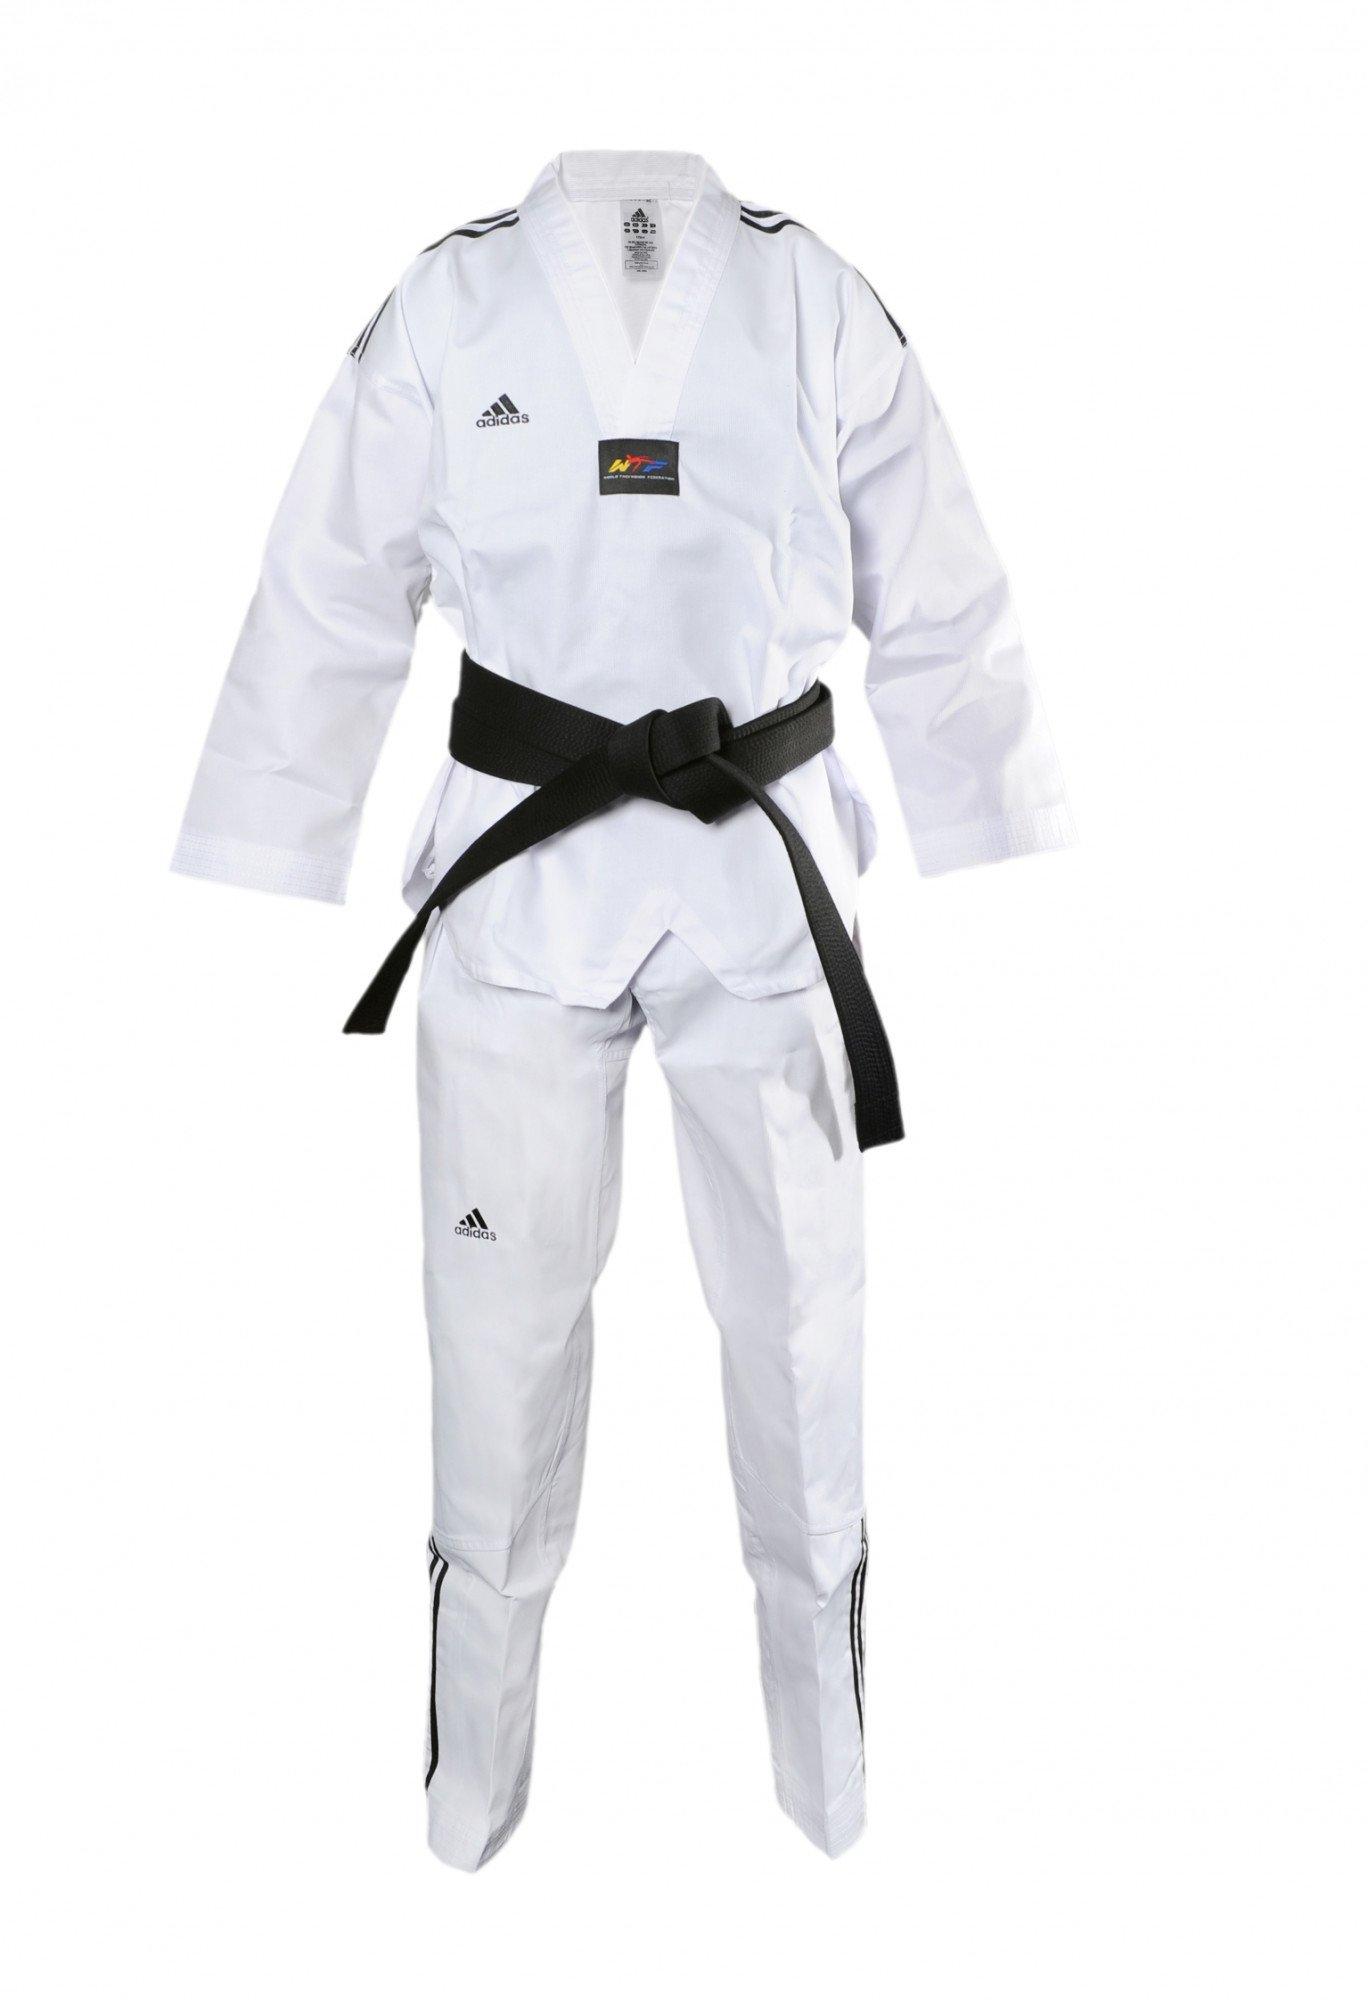 Col Taekwondo Taekwondo Dobok Dobok Blanc mO8Nnv0w